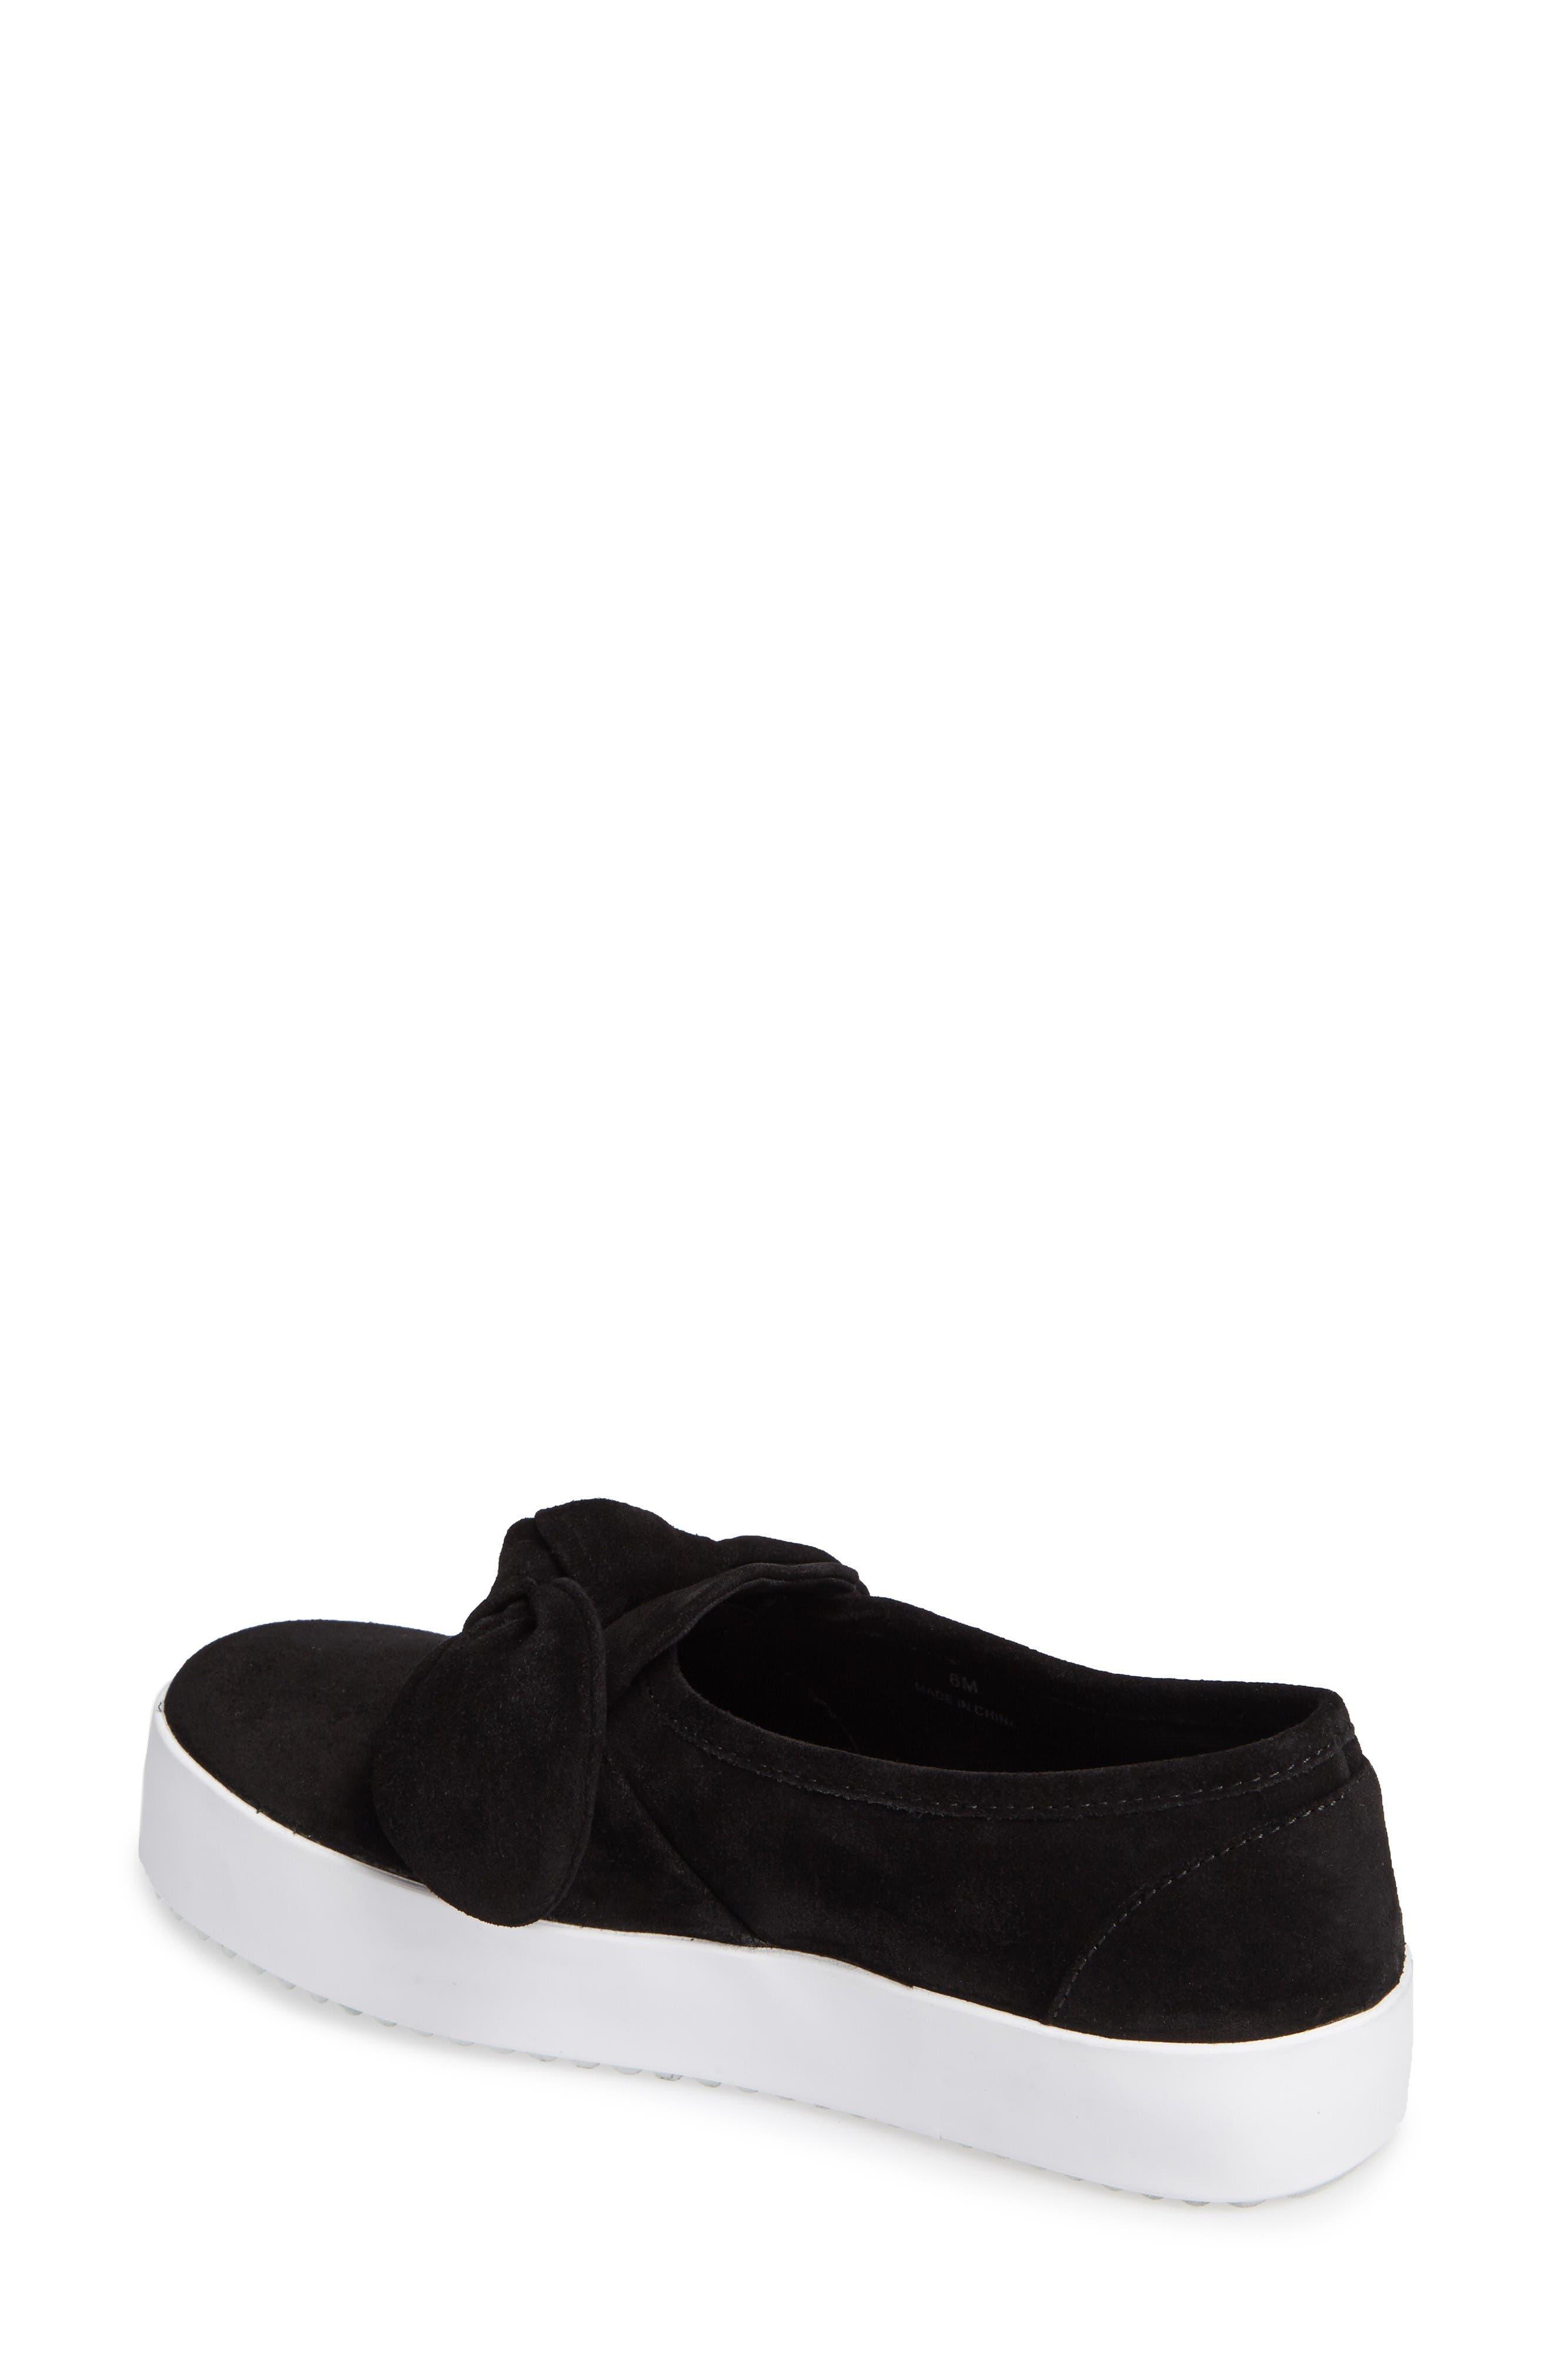 Alternate Image 2  - Rebecca Minkoff Stacey Bow Platform Sneaker (Women)